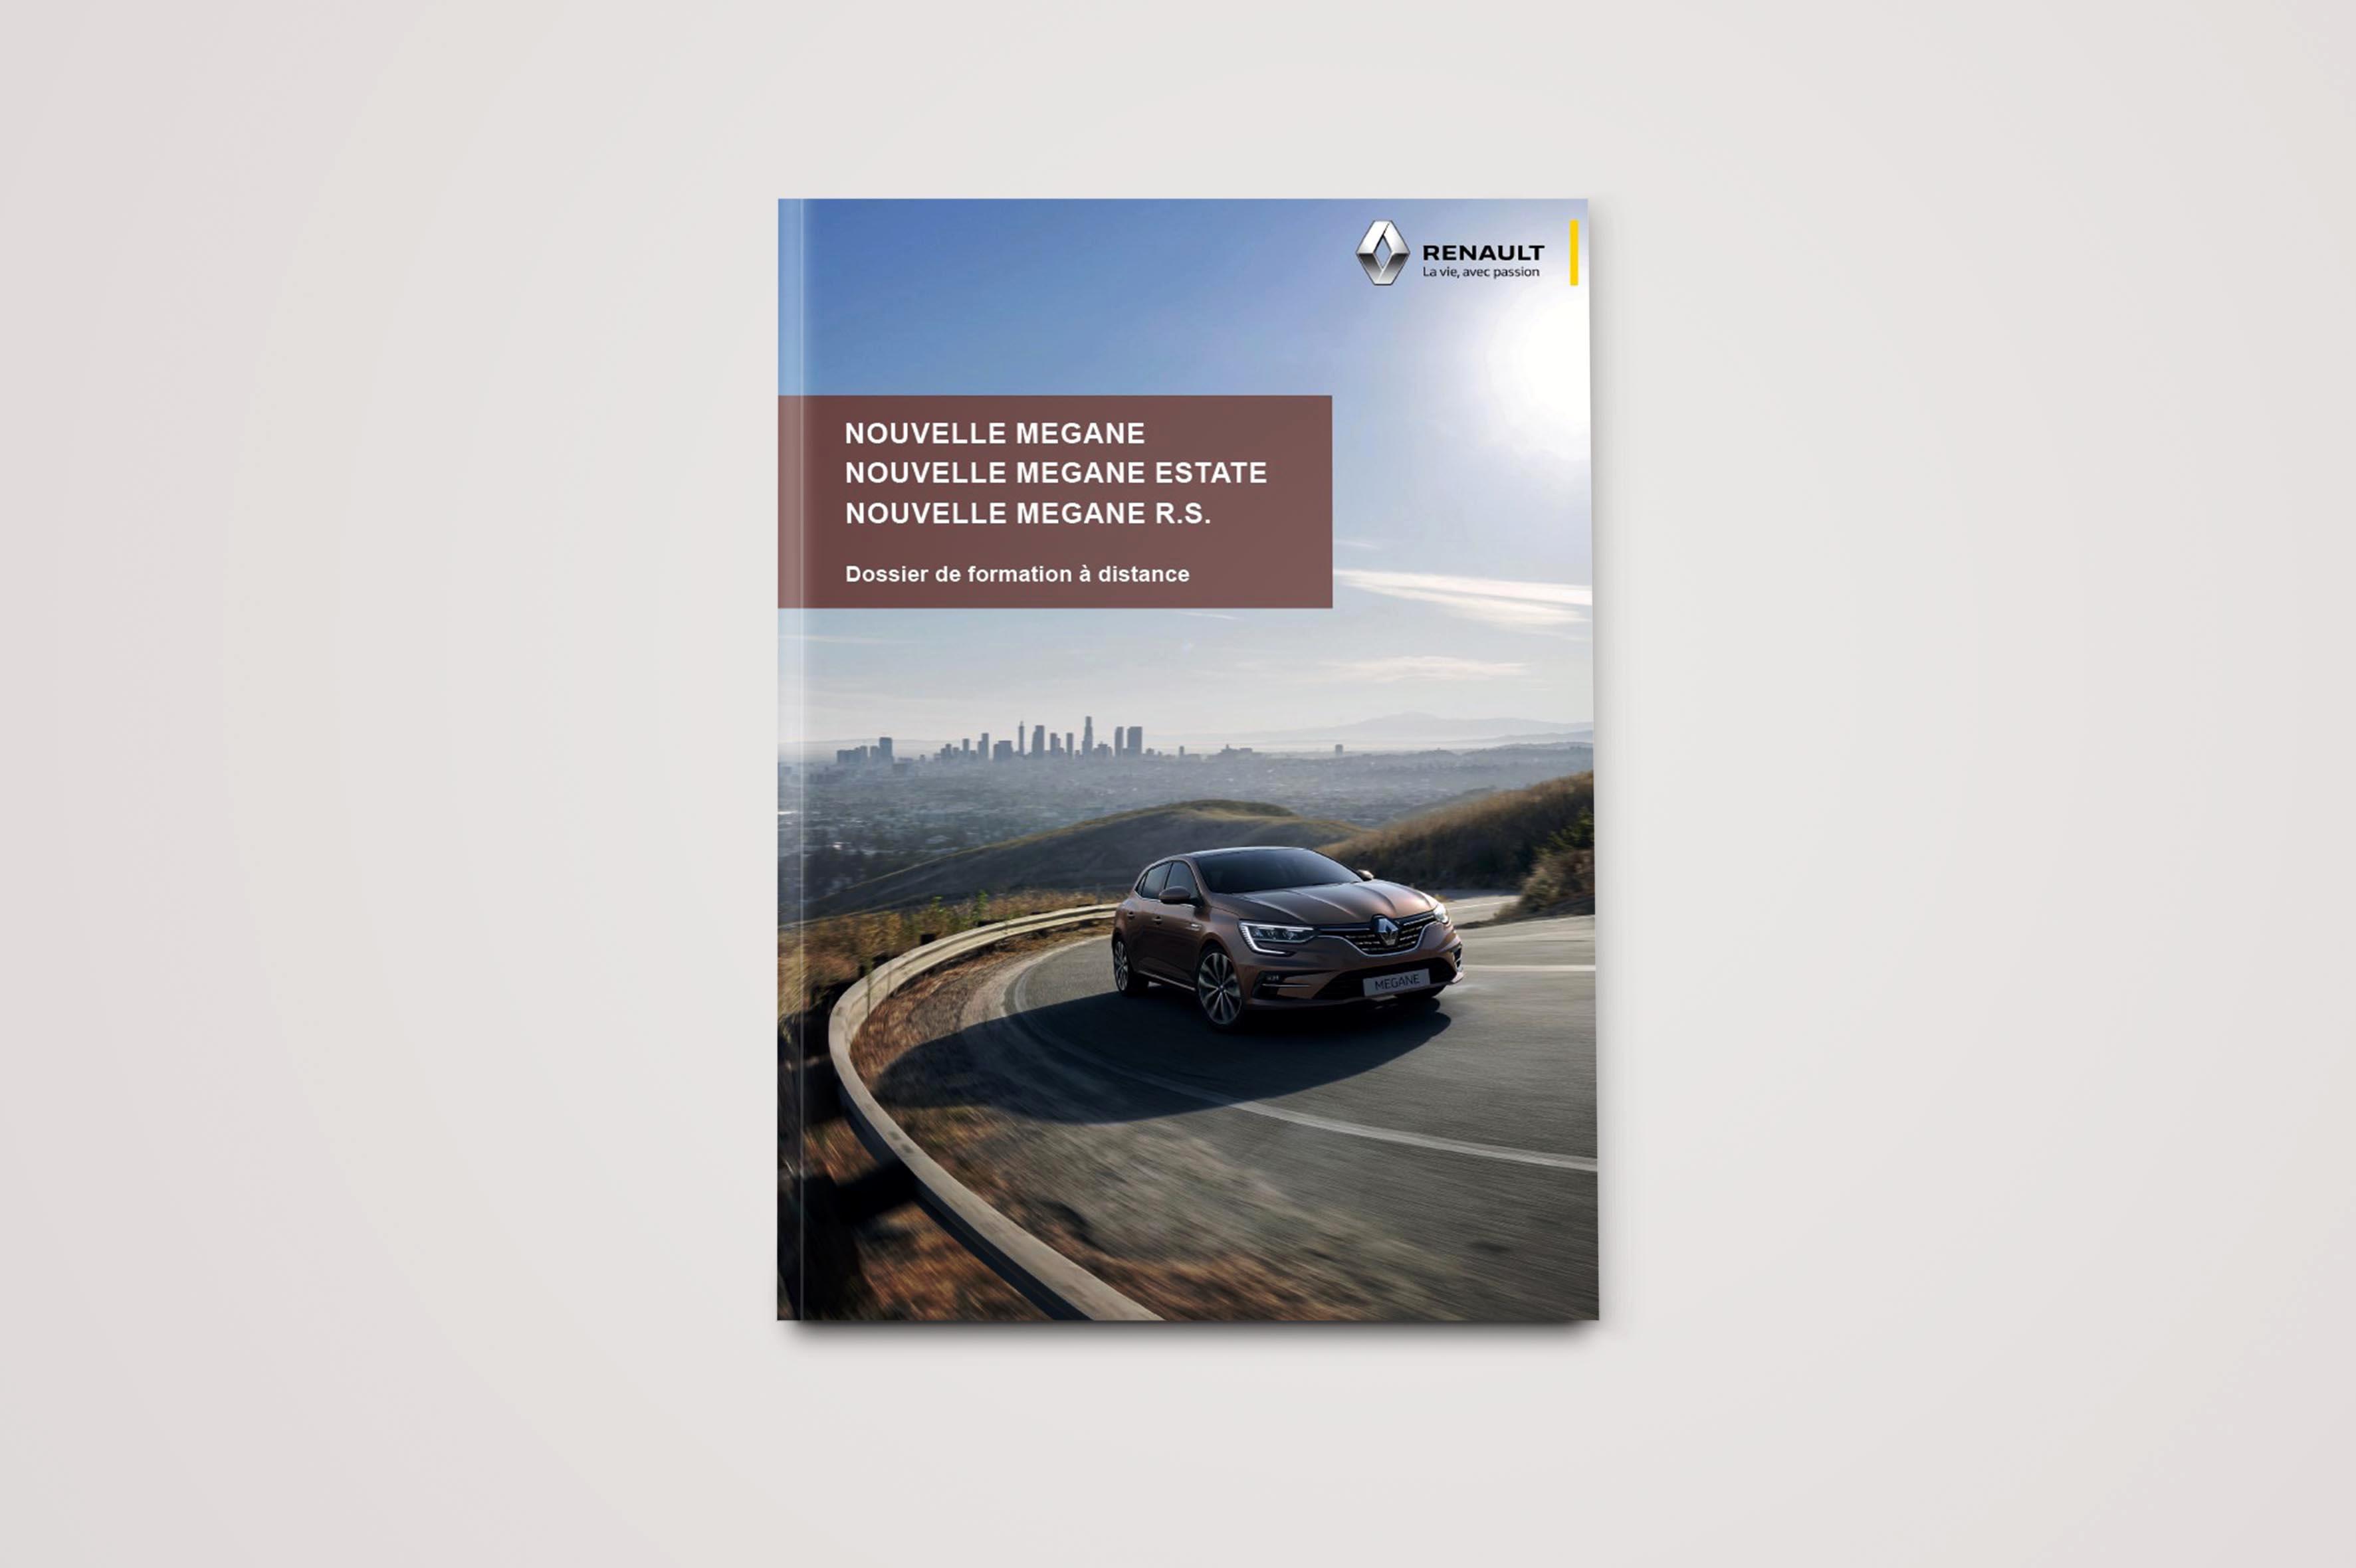 Renault_Borchure_2020